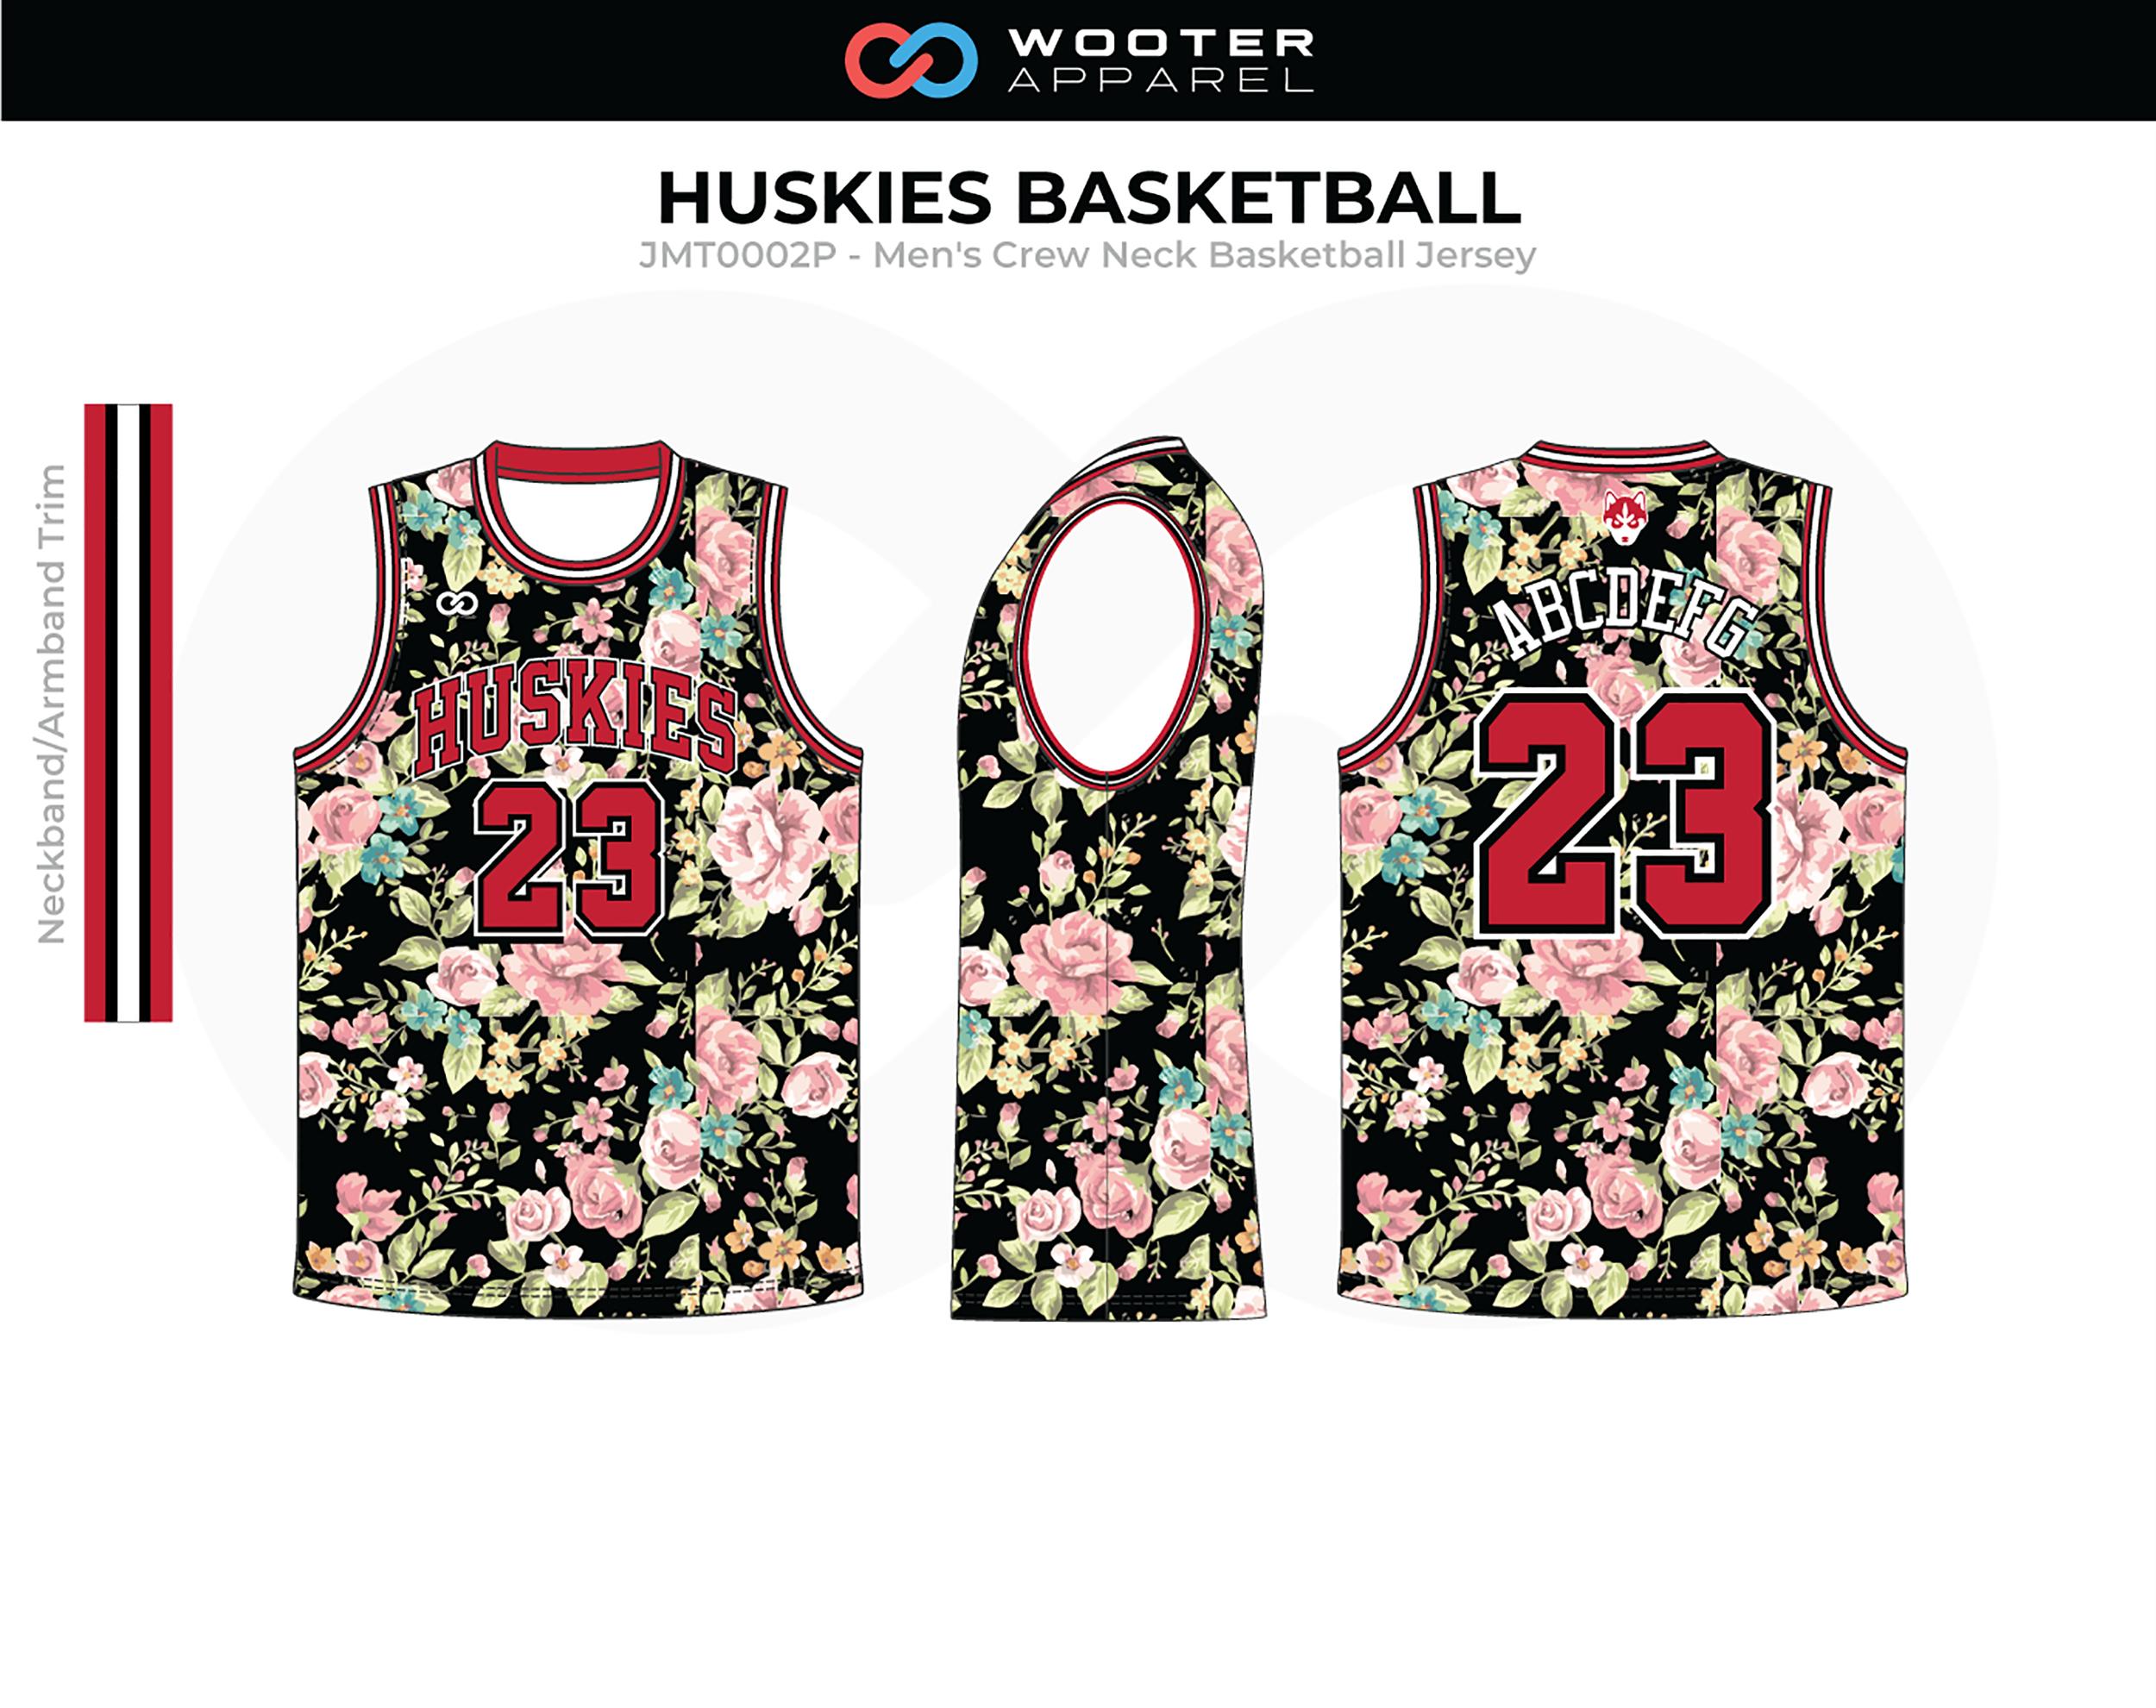 HUSKIES Pink Green Black Red Men's Crew Neck Basketball Jersey